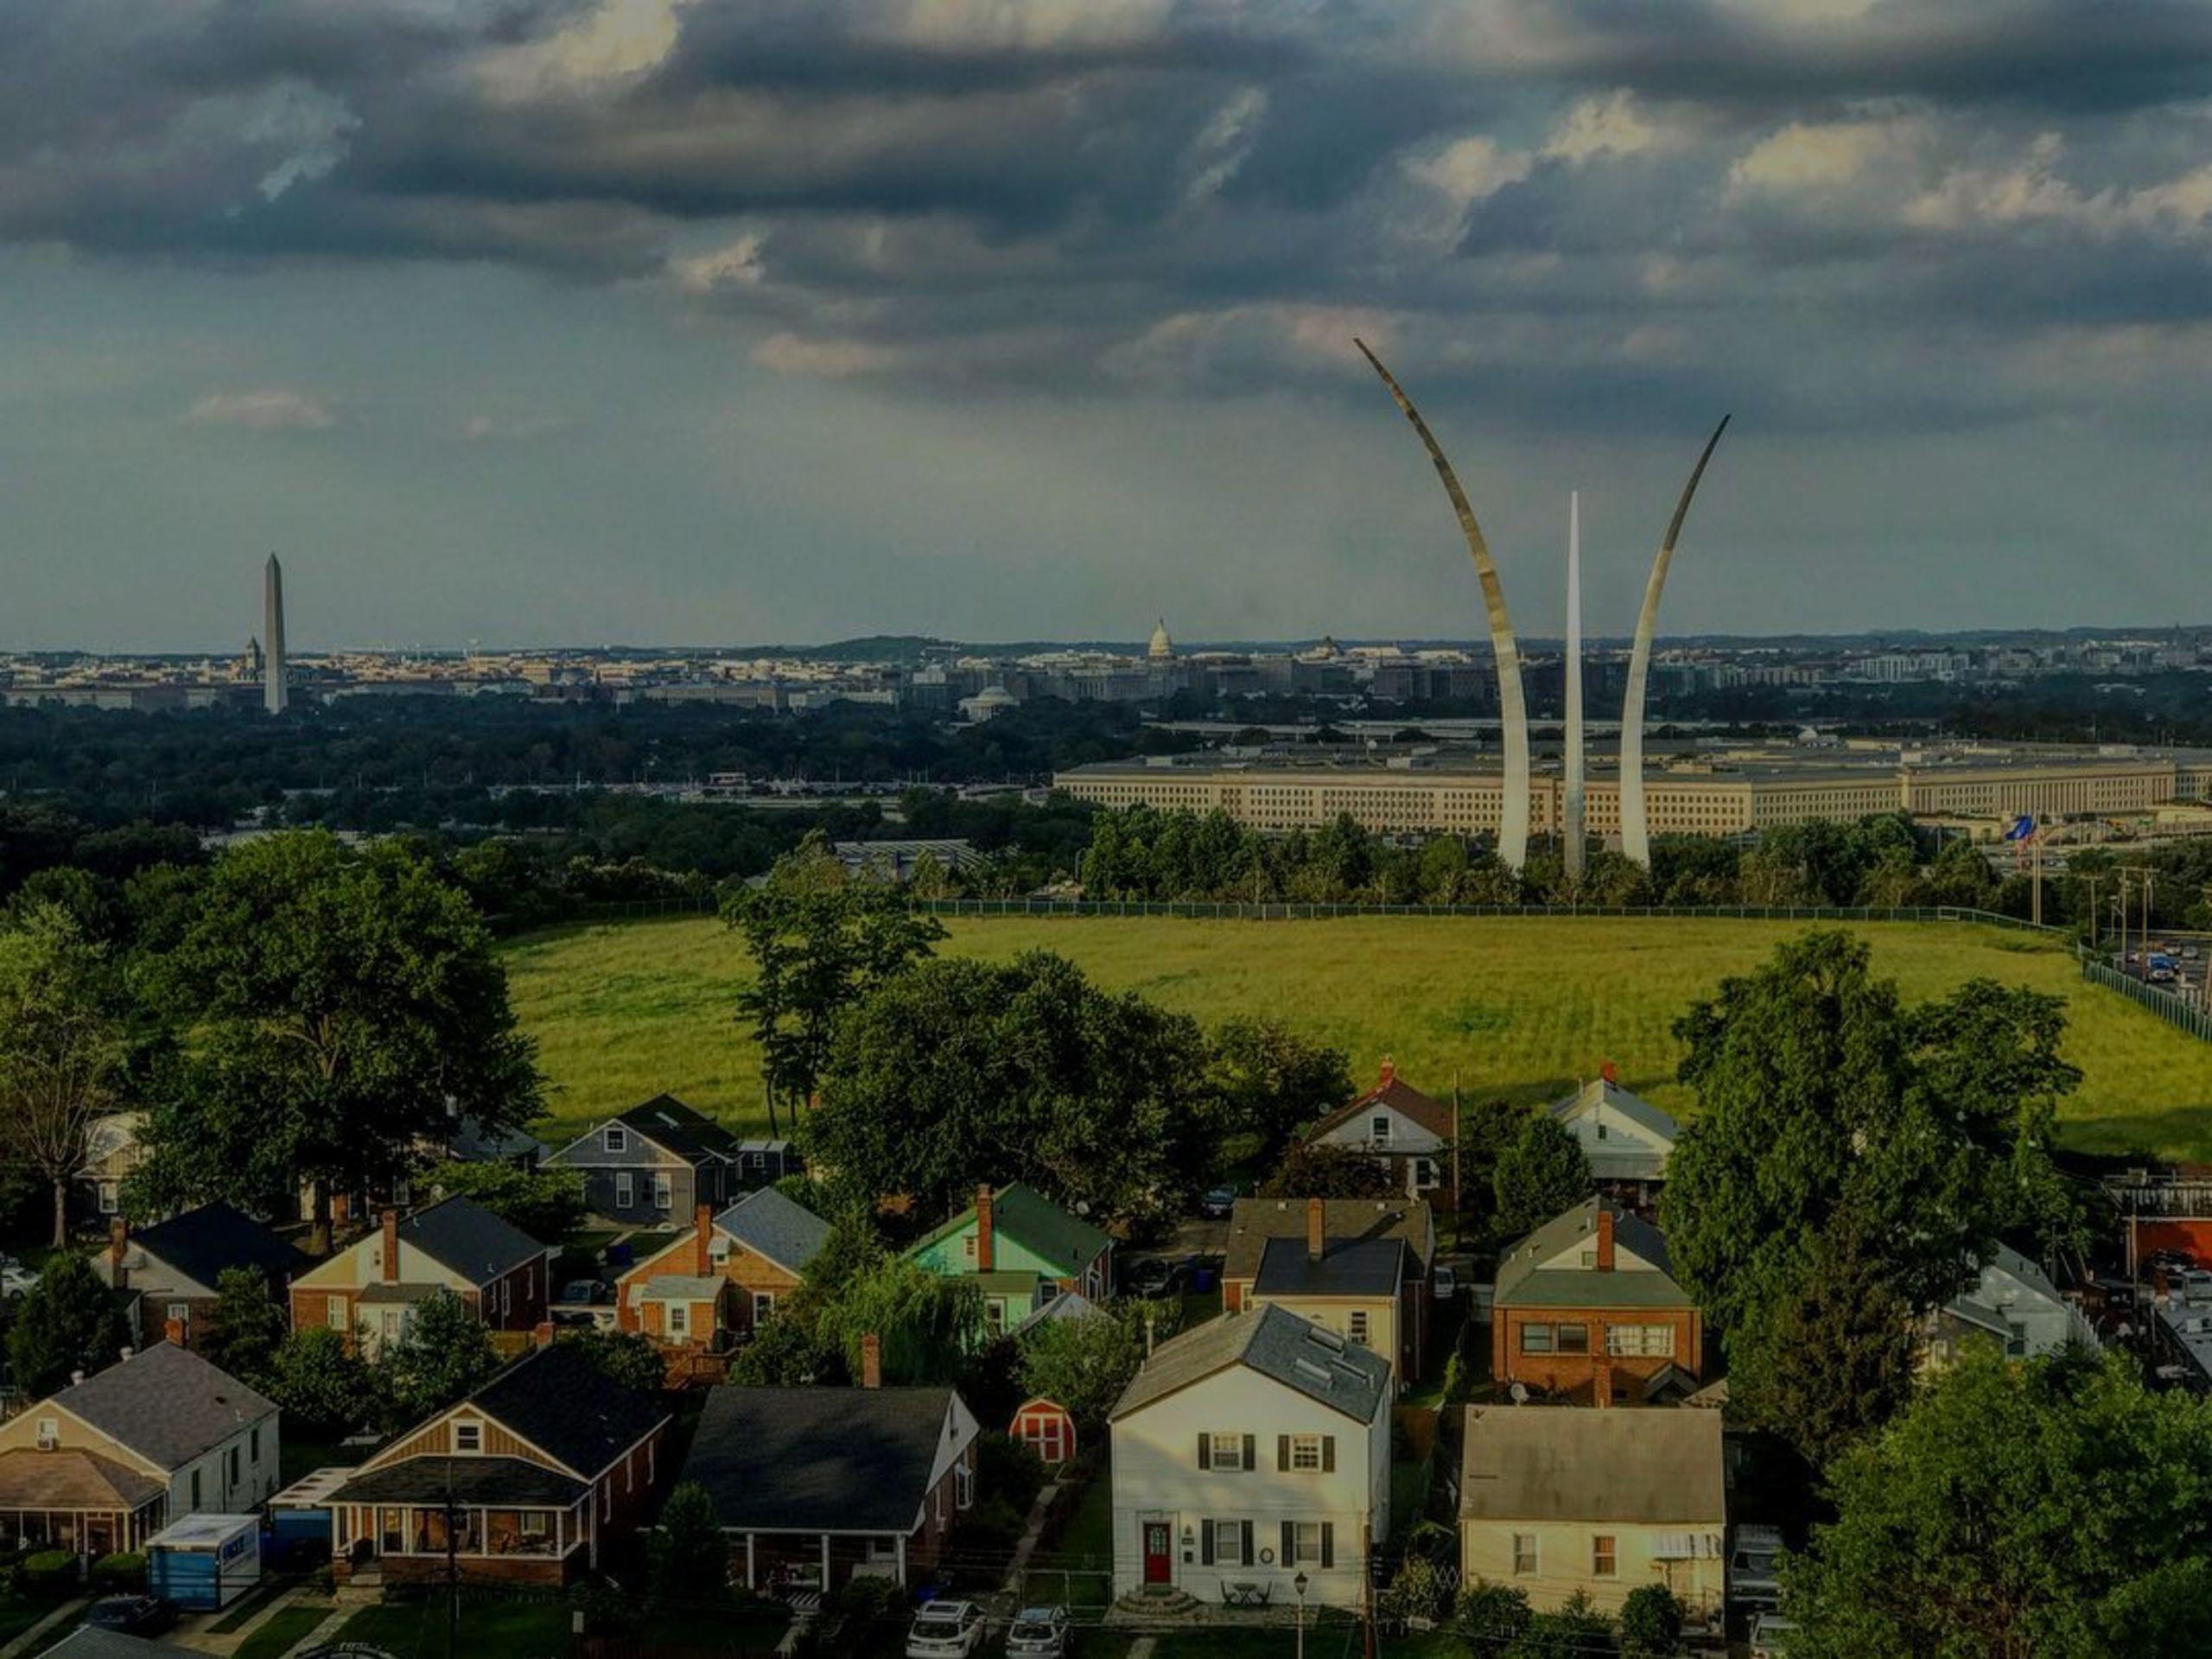 10 of the hottest neighborhoods in Arlington, VA